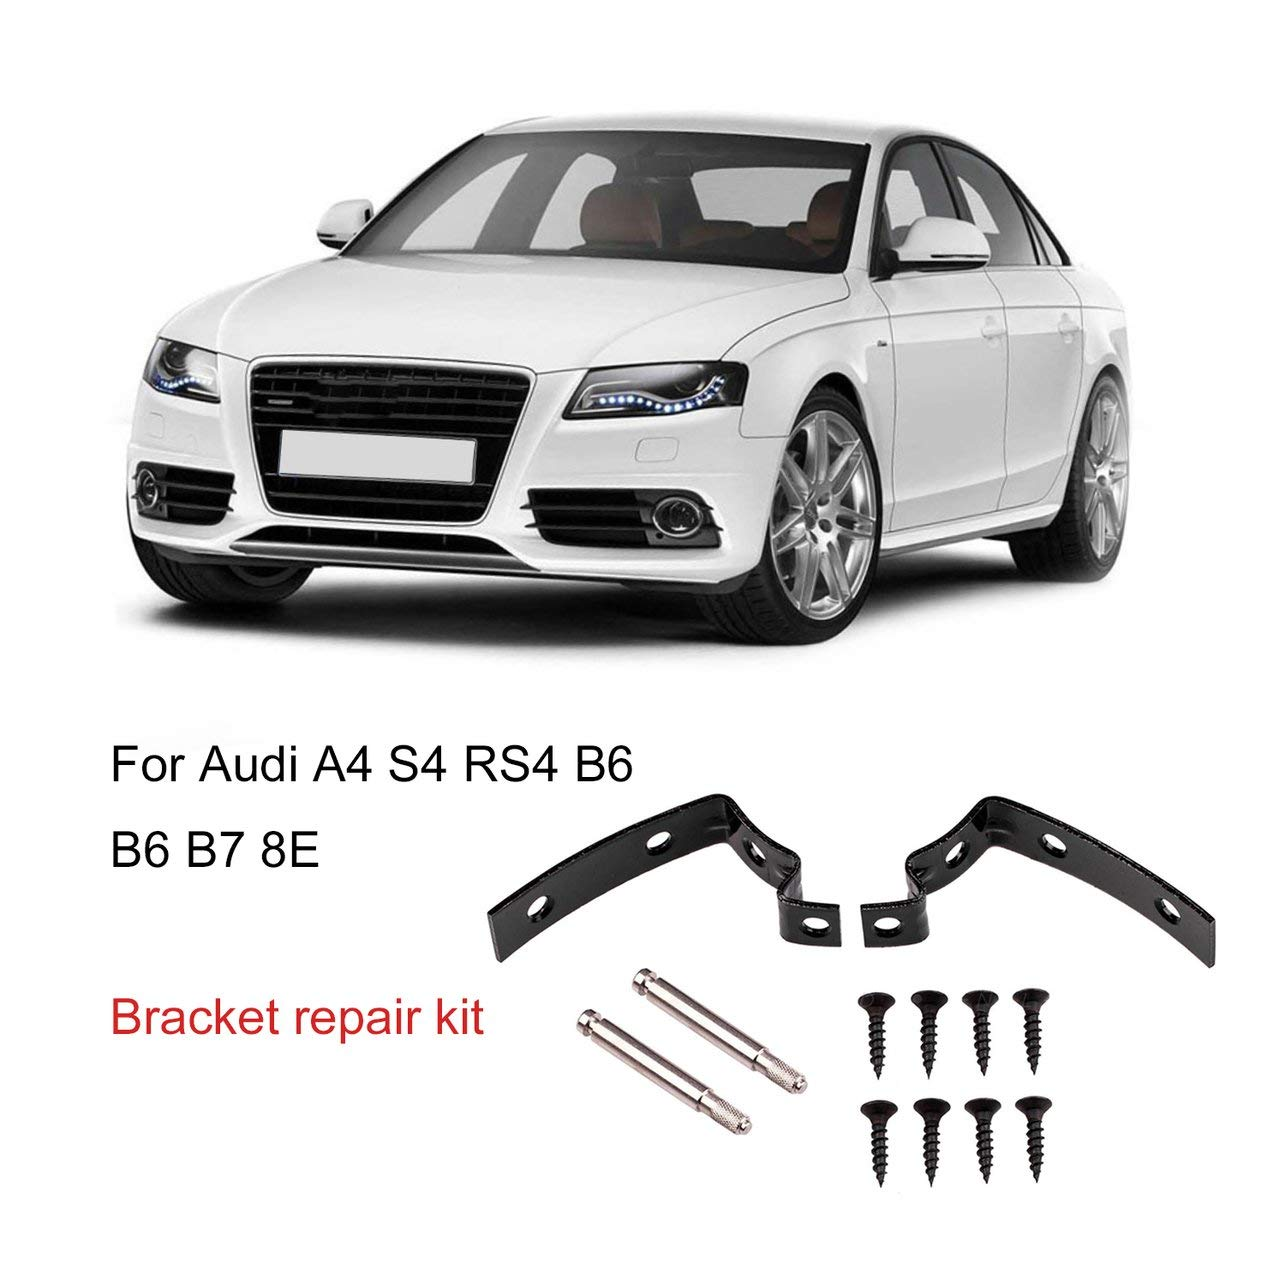 de la Herramienta de reparaci/ón Tapa de la guantera 2002-2008 WOSOSYEYO Bisagra Soporte del Coche Kit de reparaci/ón de Tapa articulada Universal para Audi A4 S4 RS4 8E B6 B7